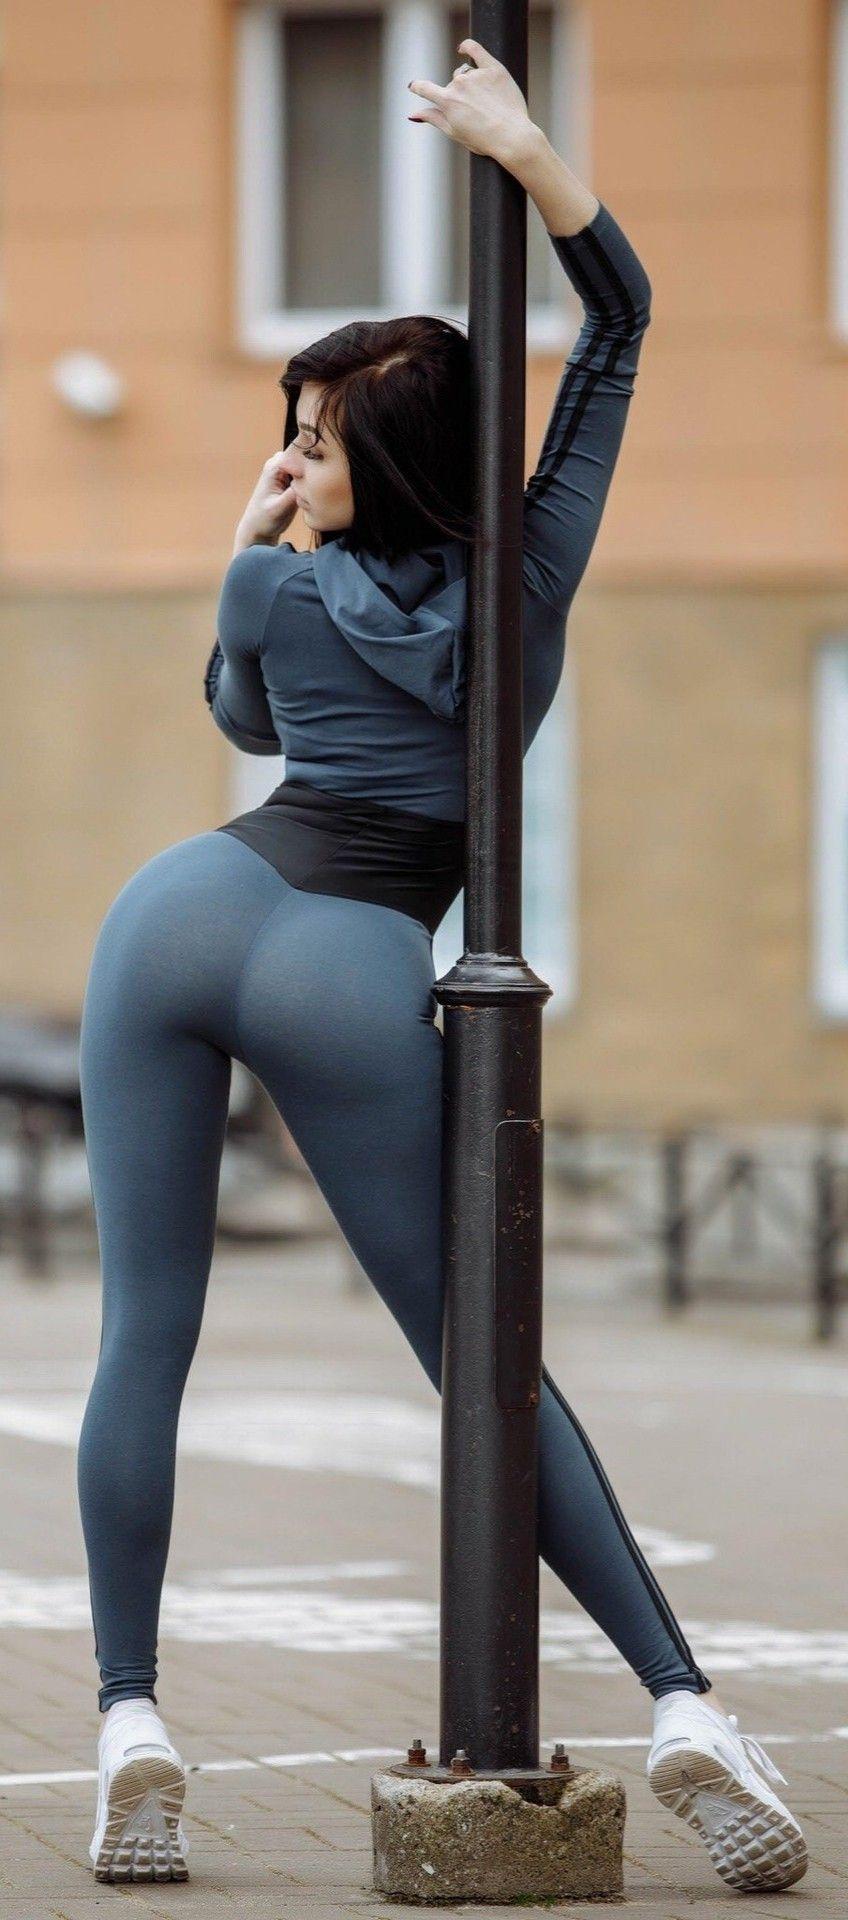 ass tight Asian girl